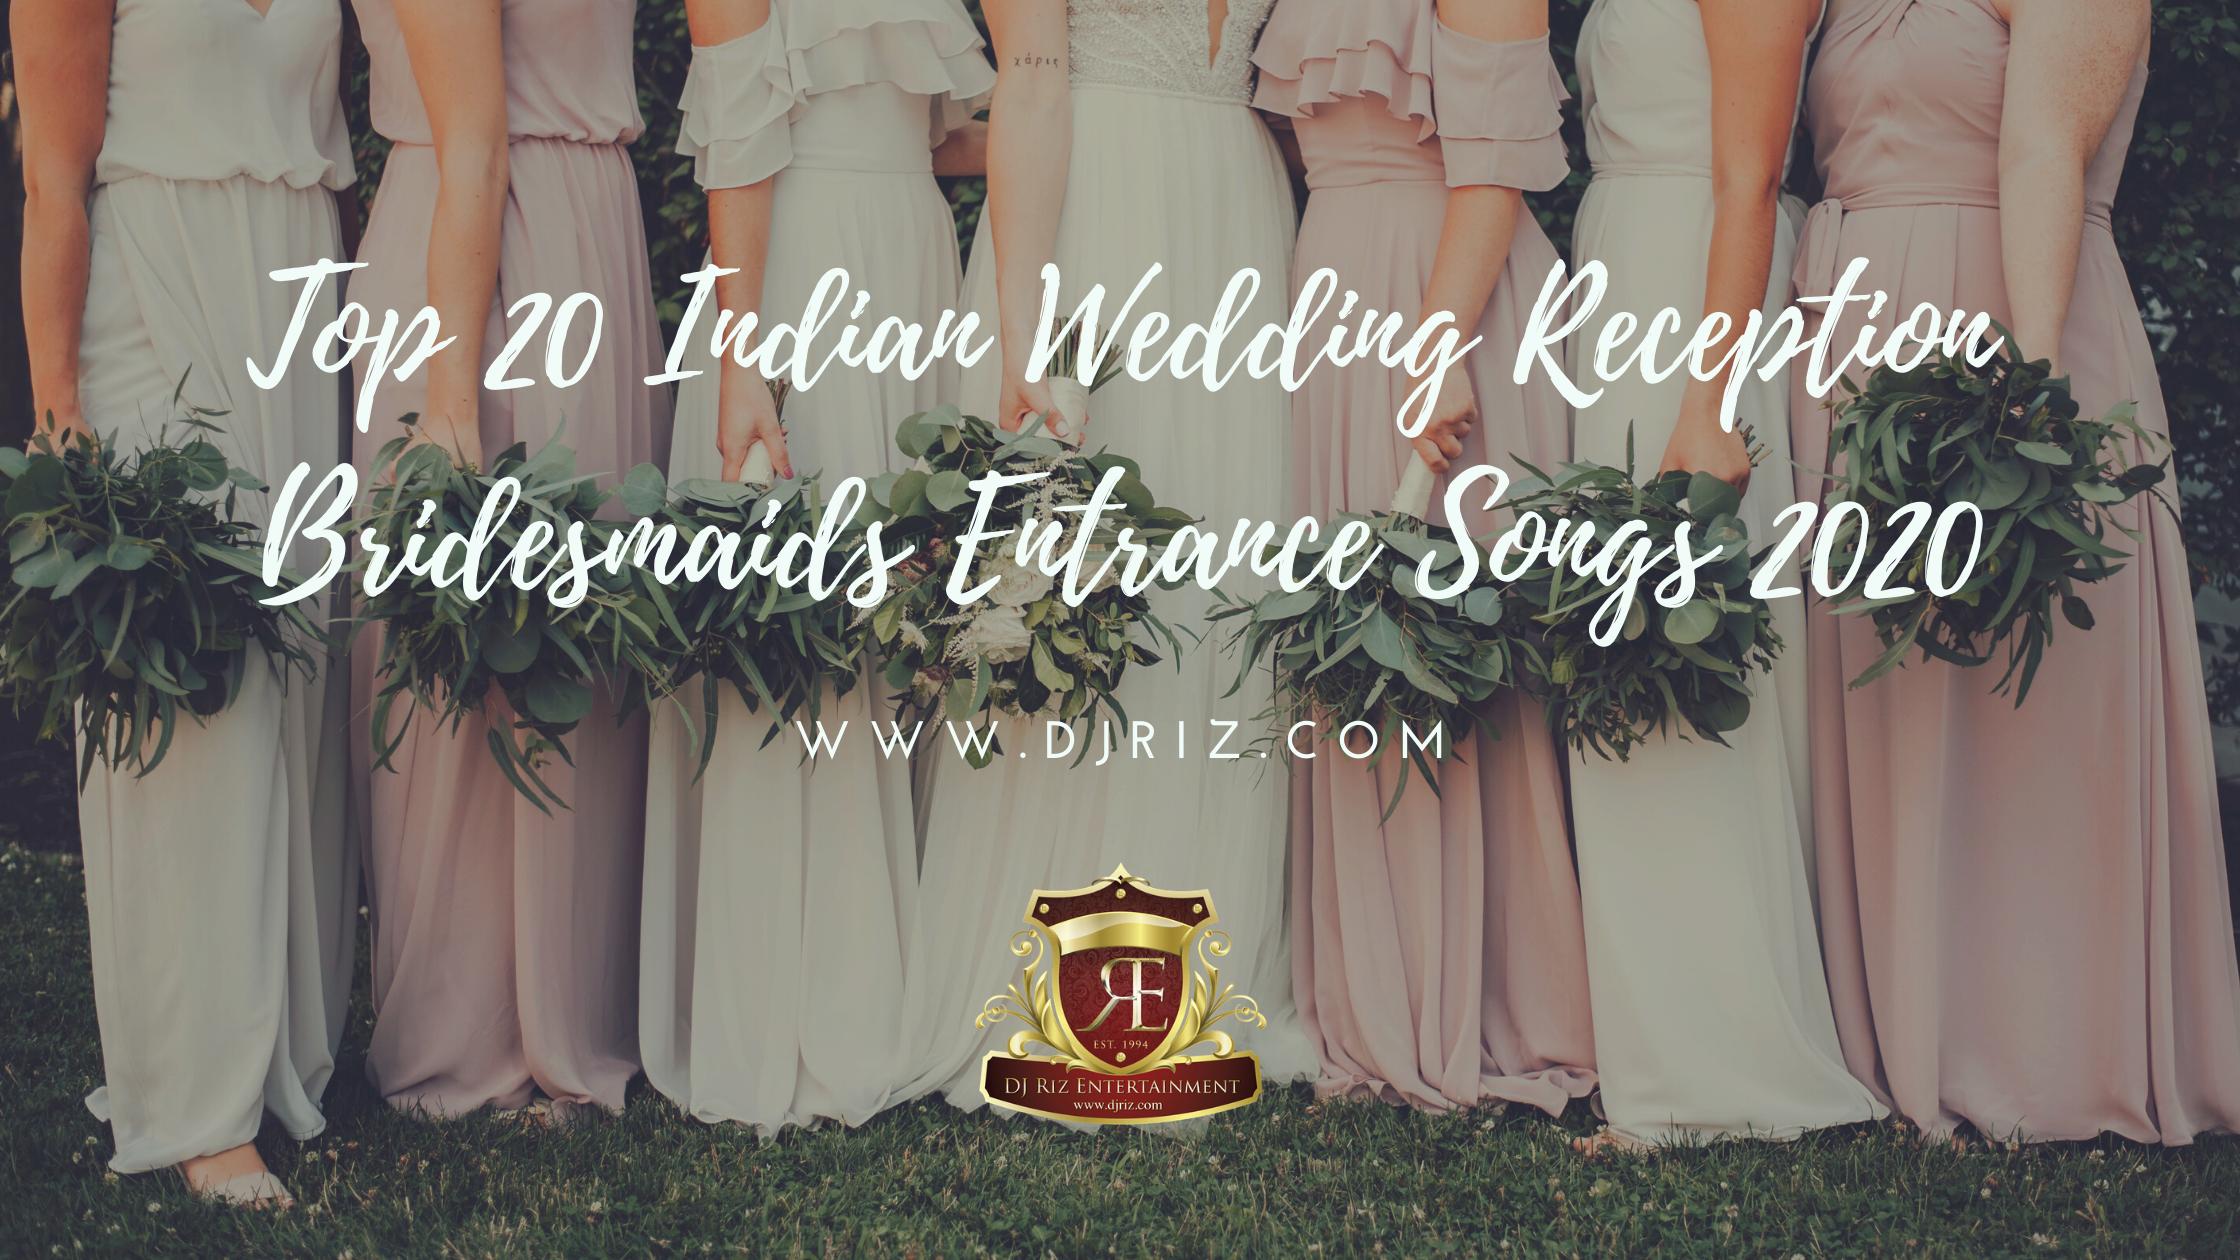 Top 20 Indian Wedding Reception Bridesmaids Entrance Songs 2020